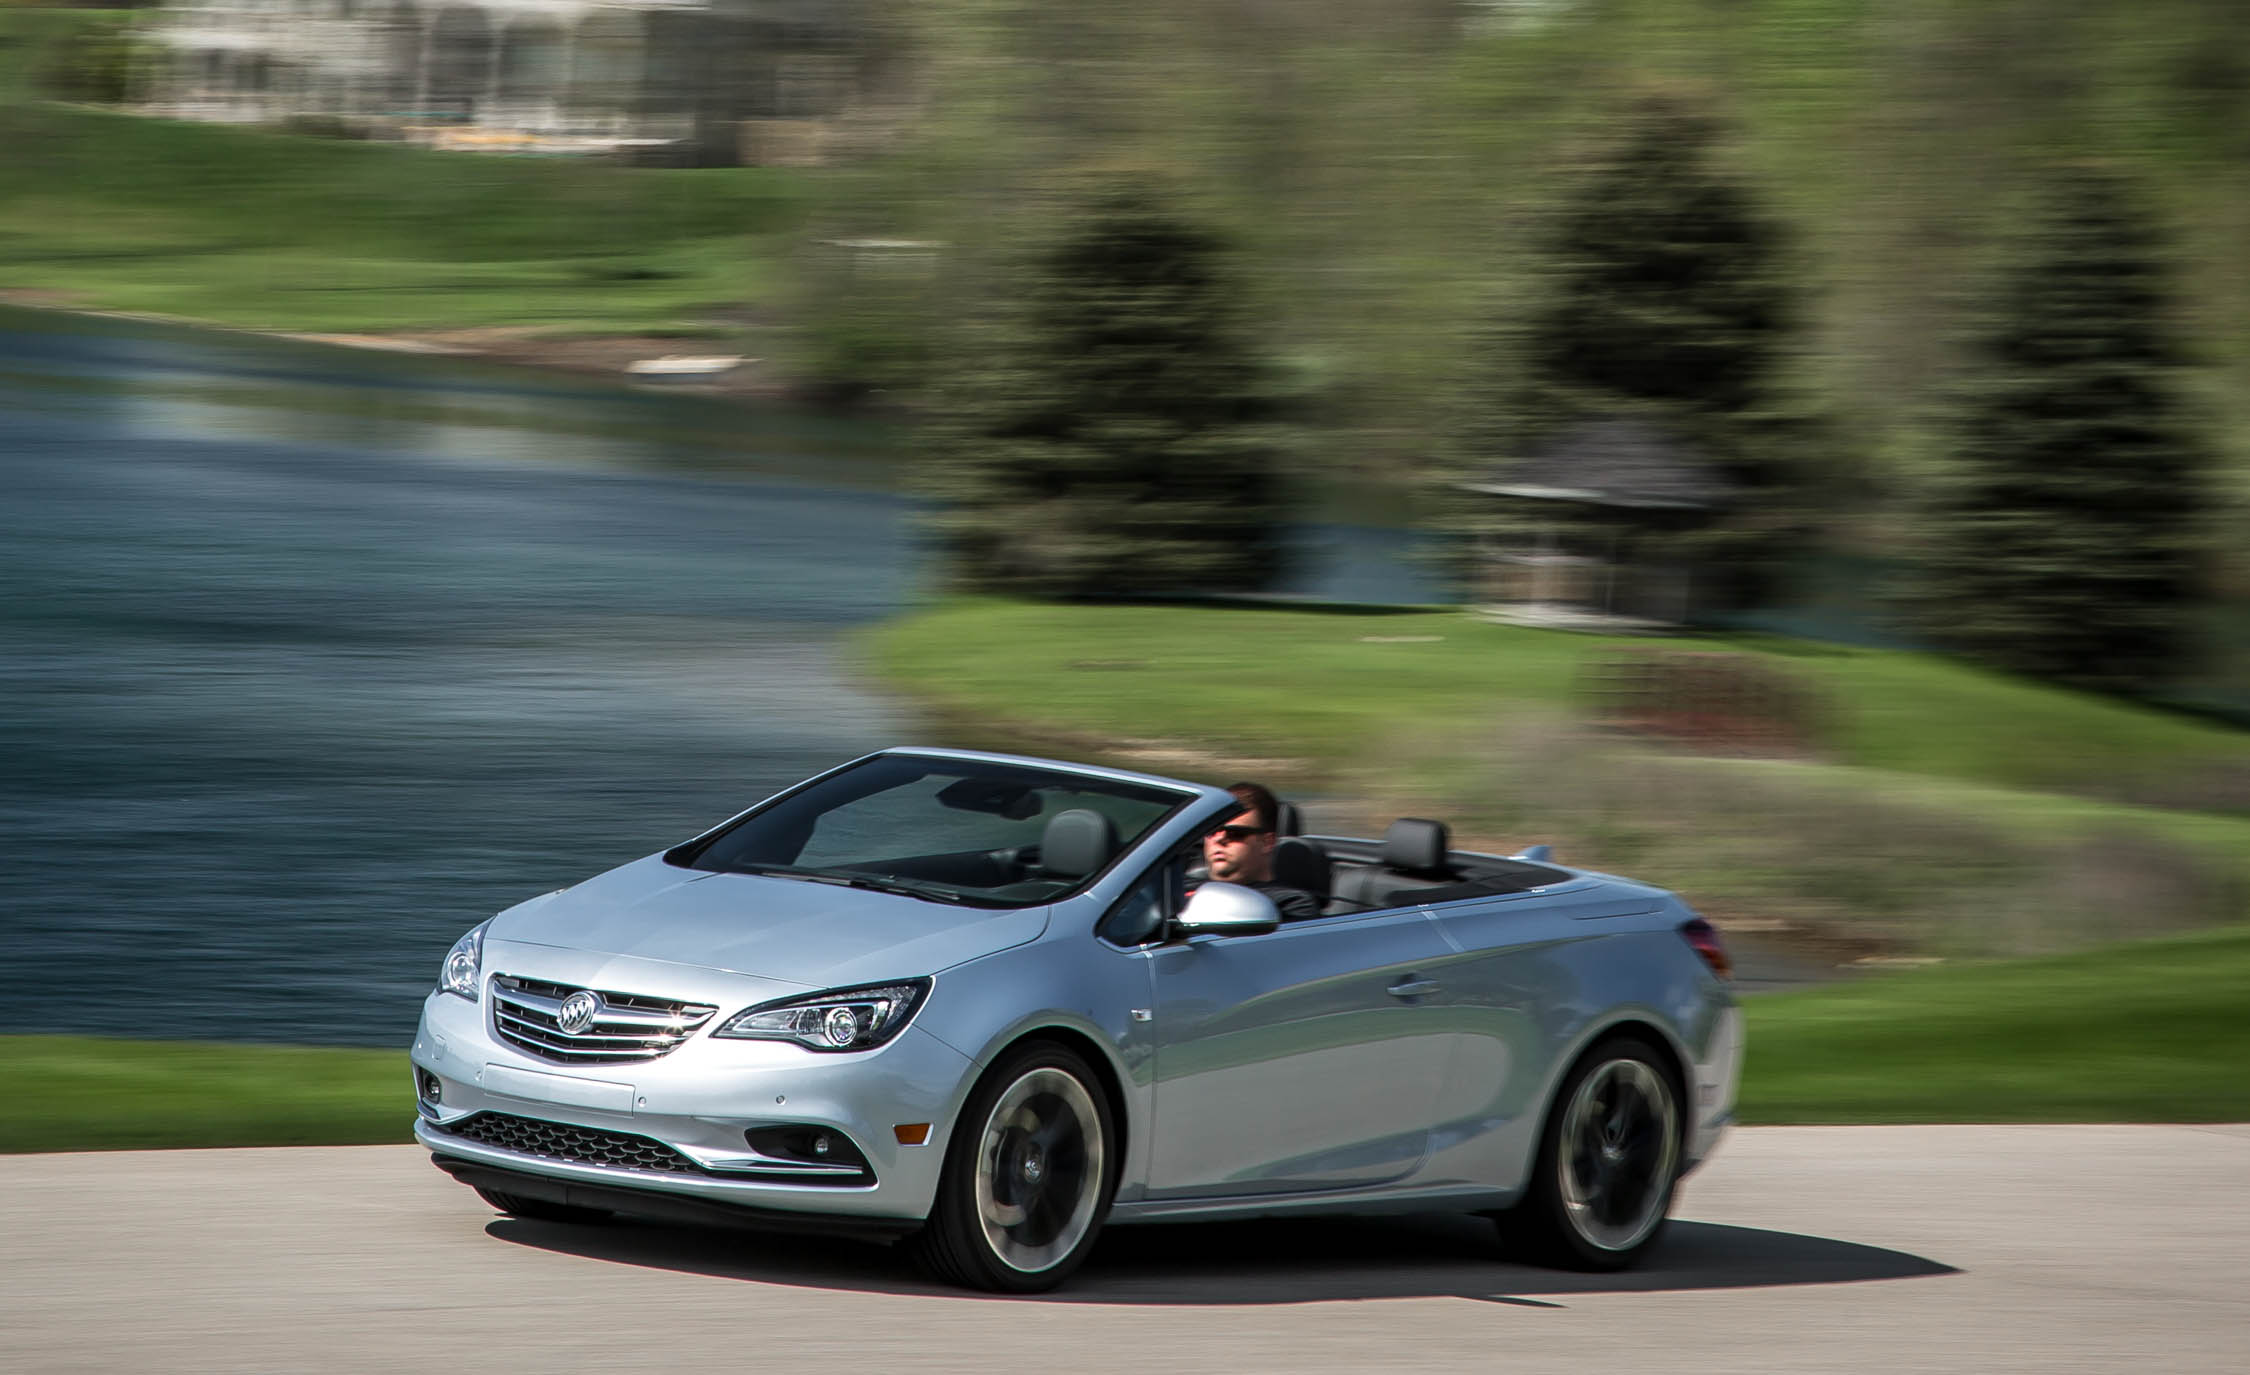 2016 Buick Cascada Premium (View 12 of 24)